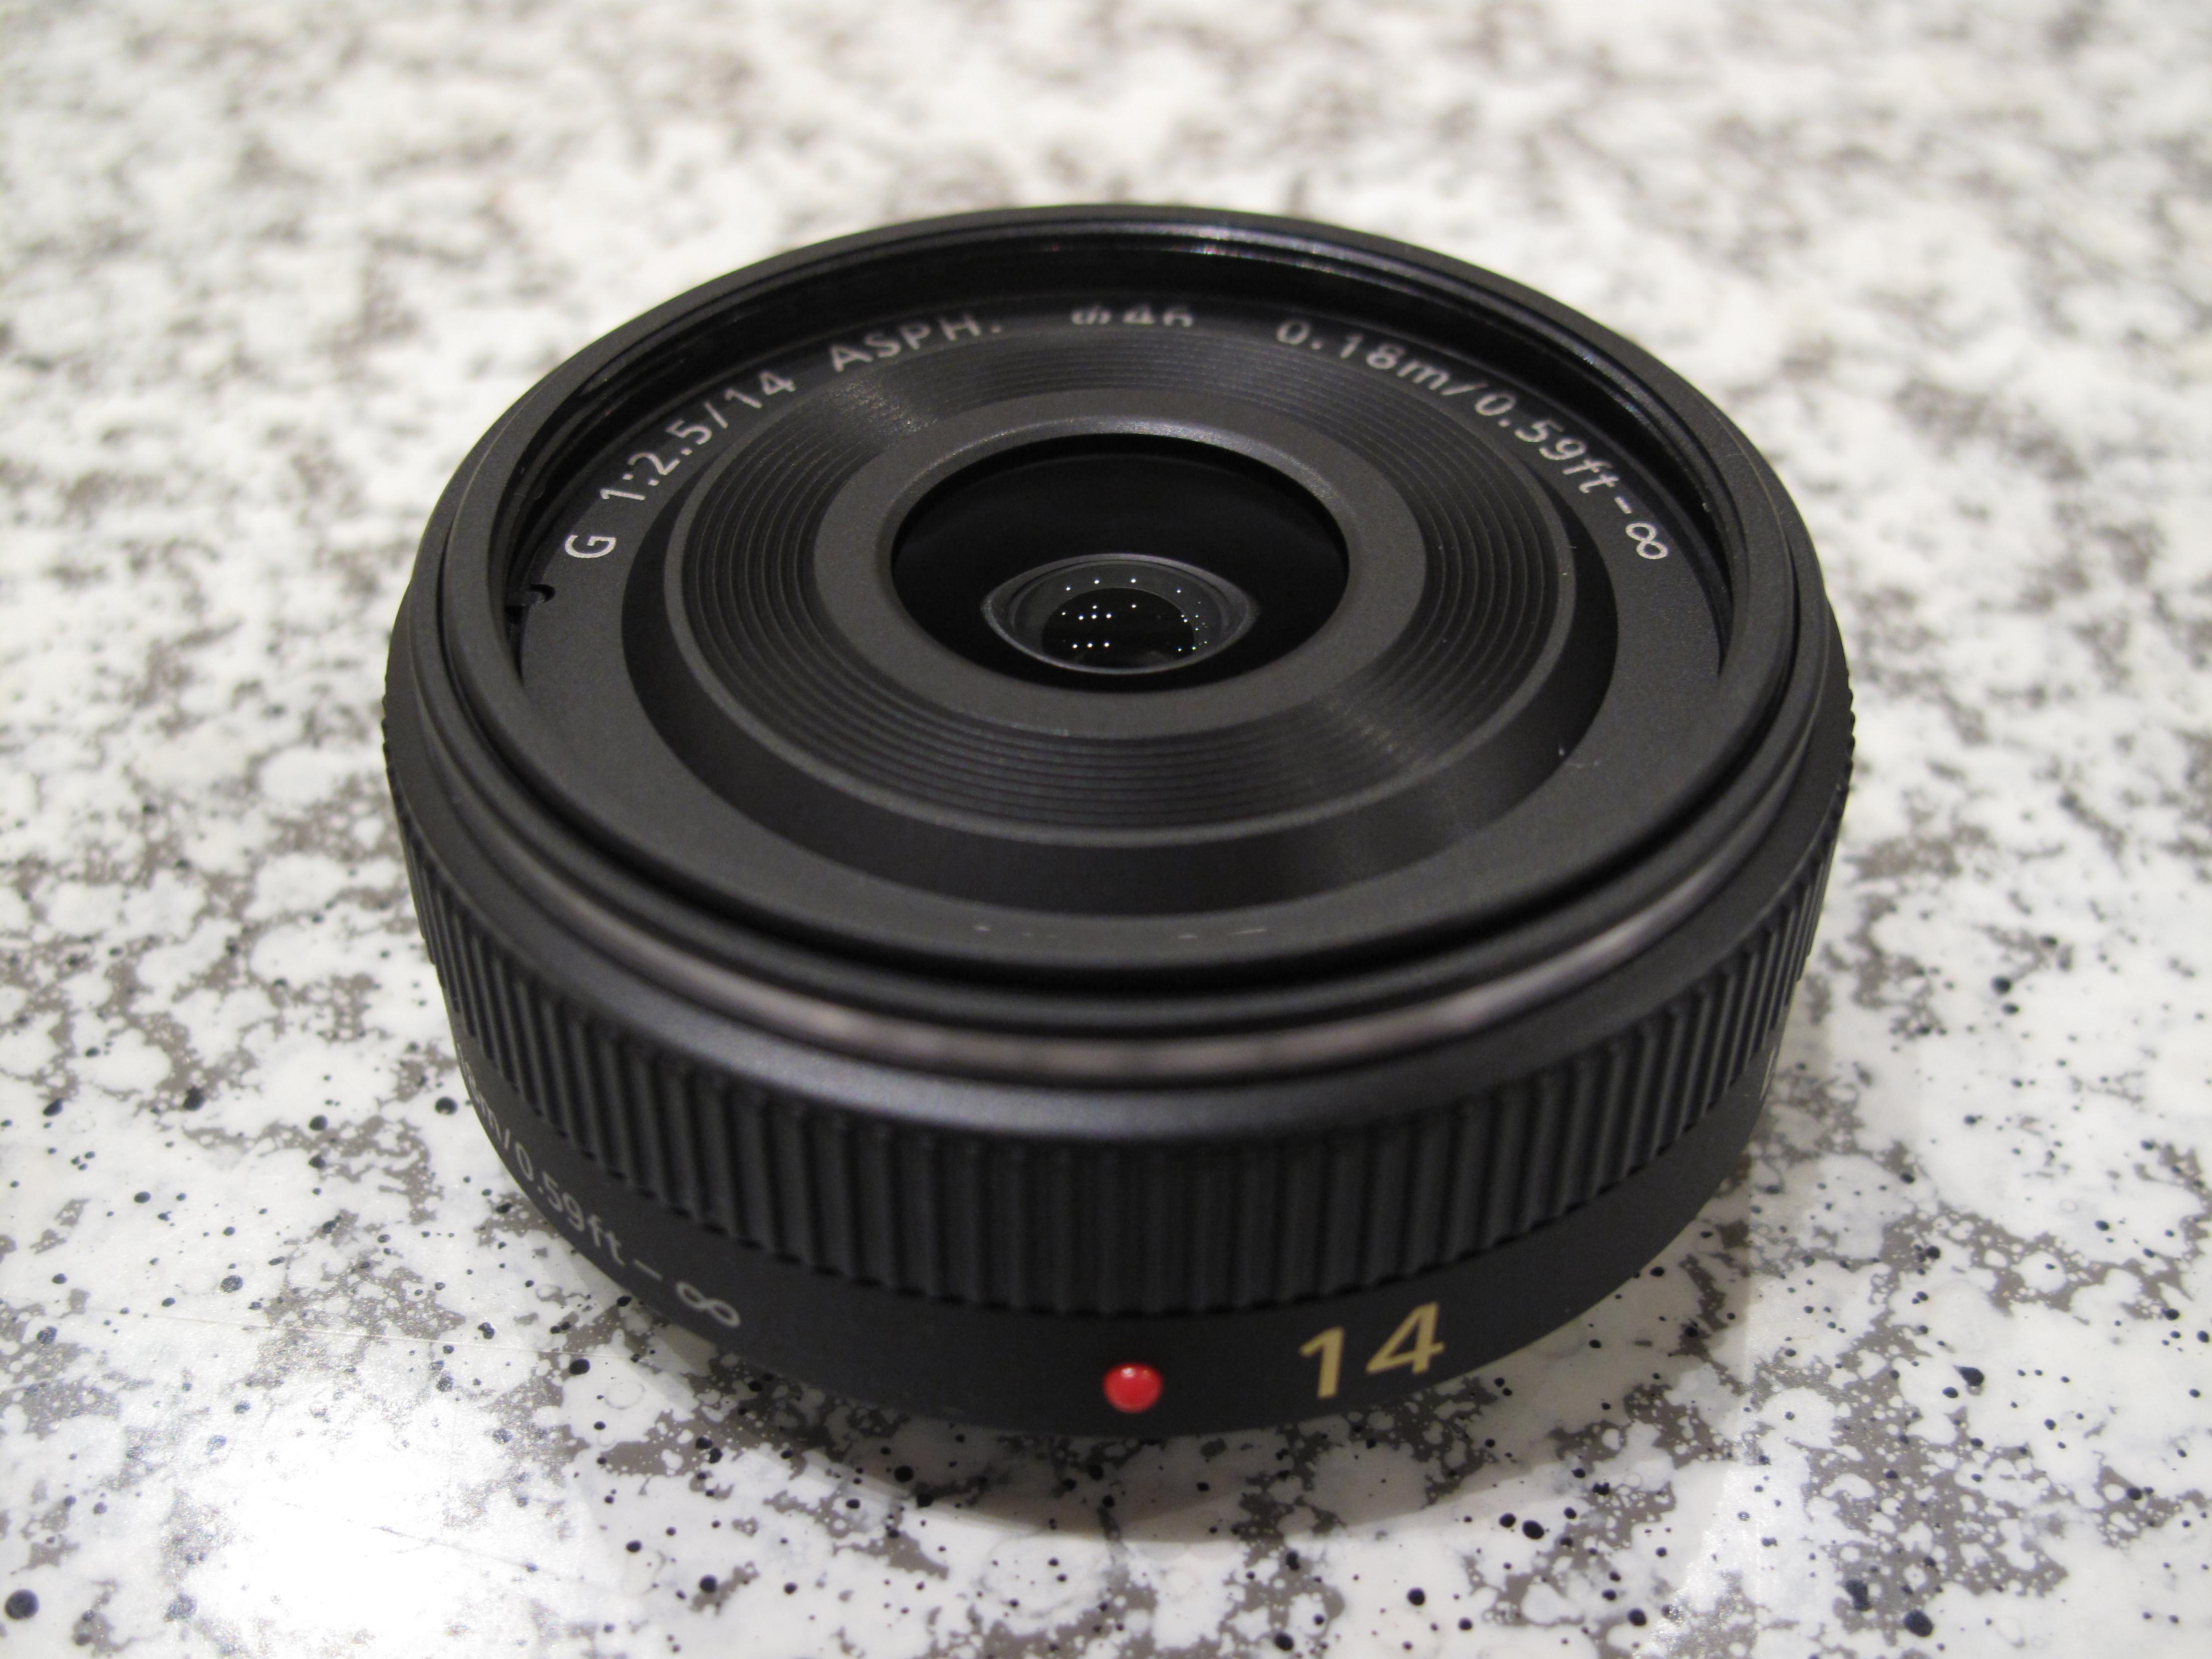 File:LUMIX G 14mm-F2.5 ASPH. (6574627925).jpg - Wikimedia Commons